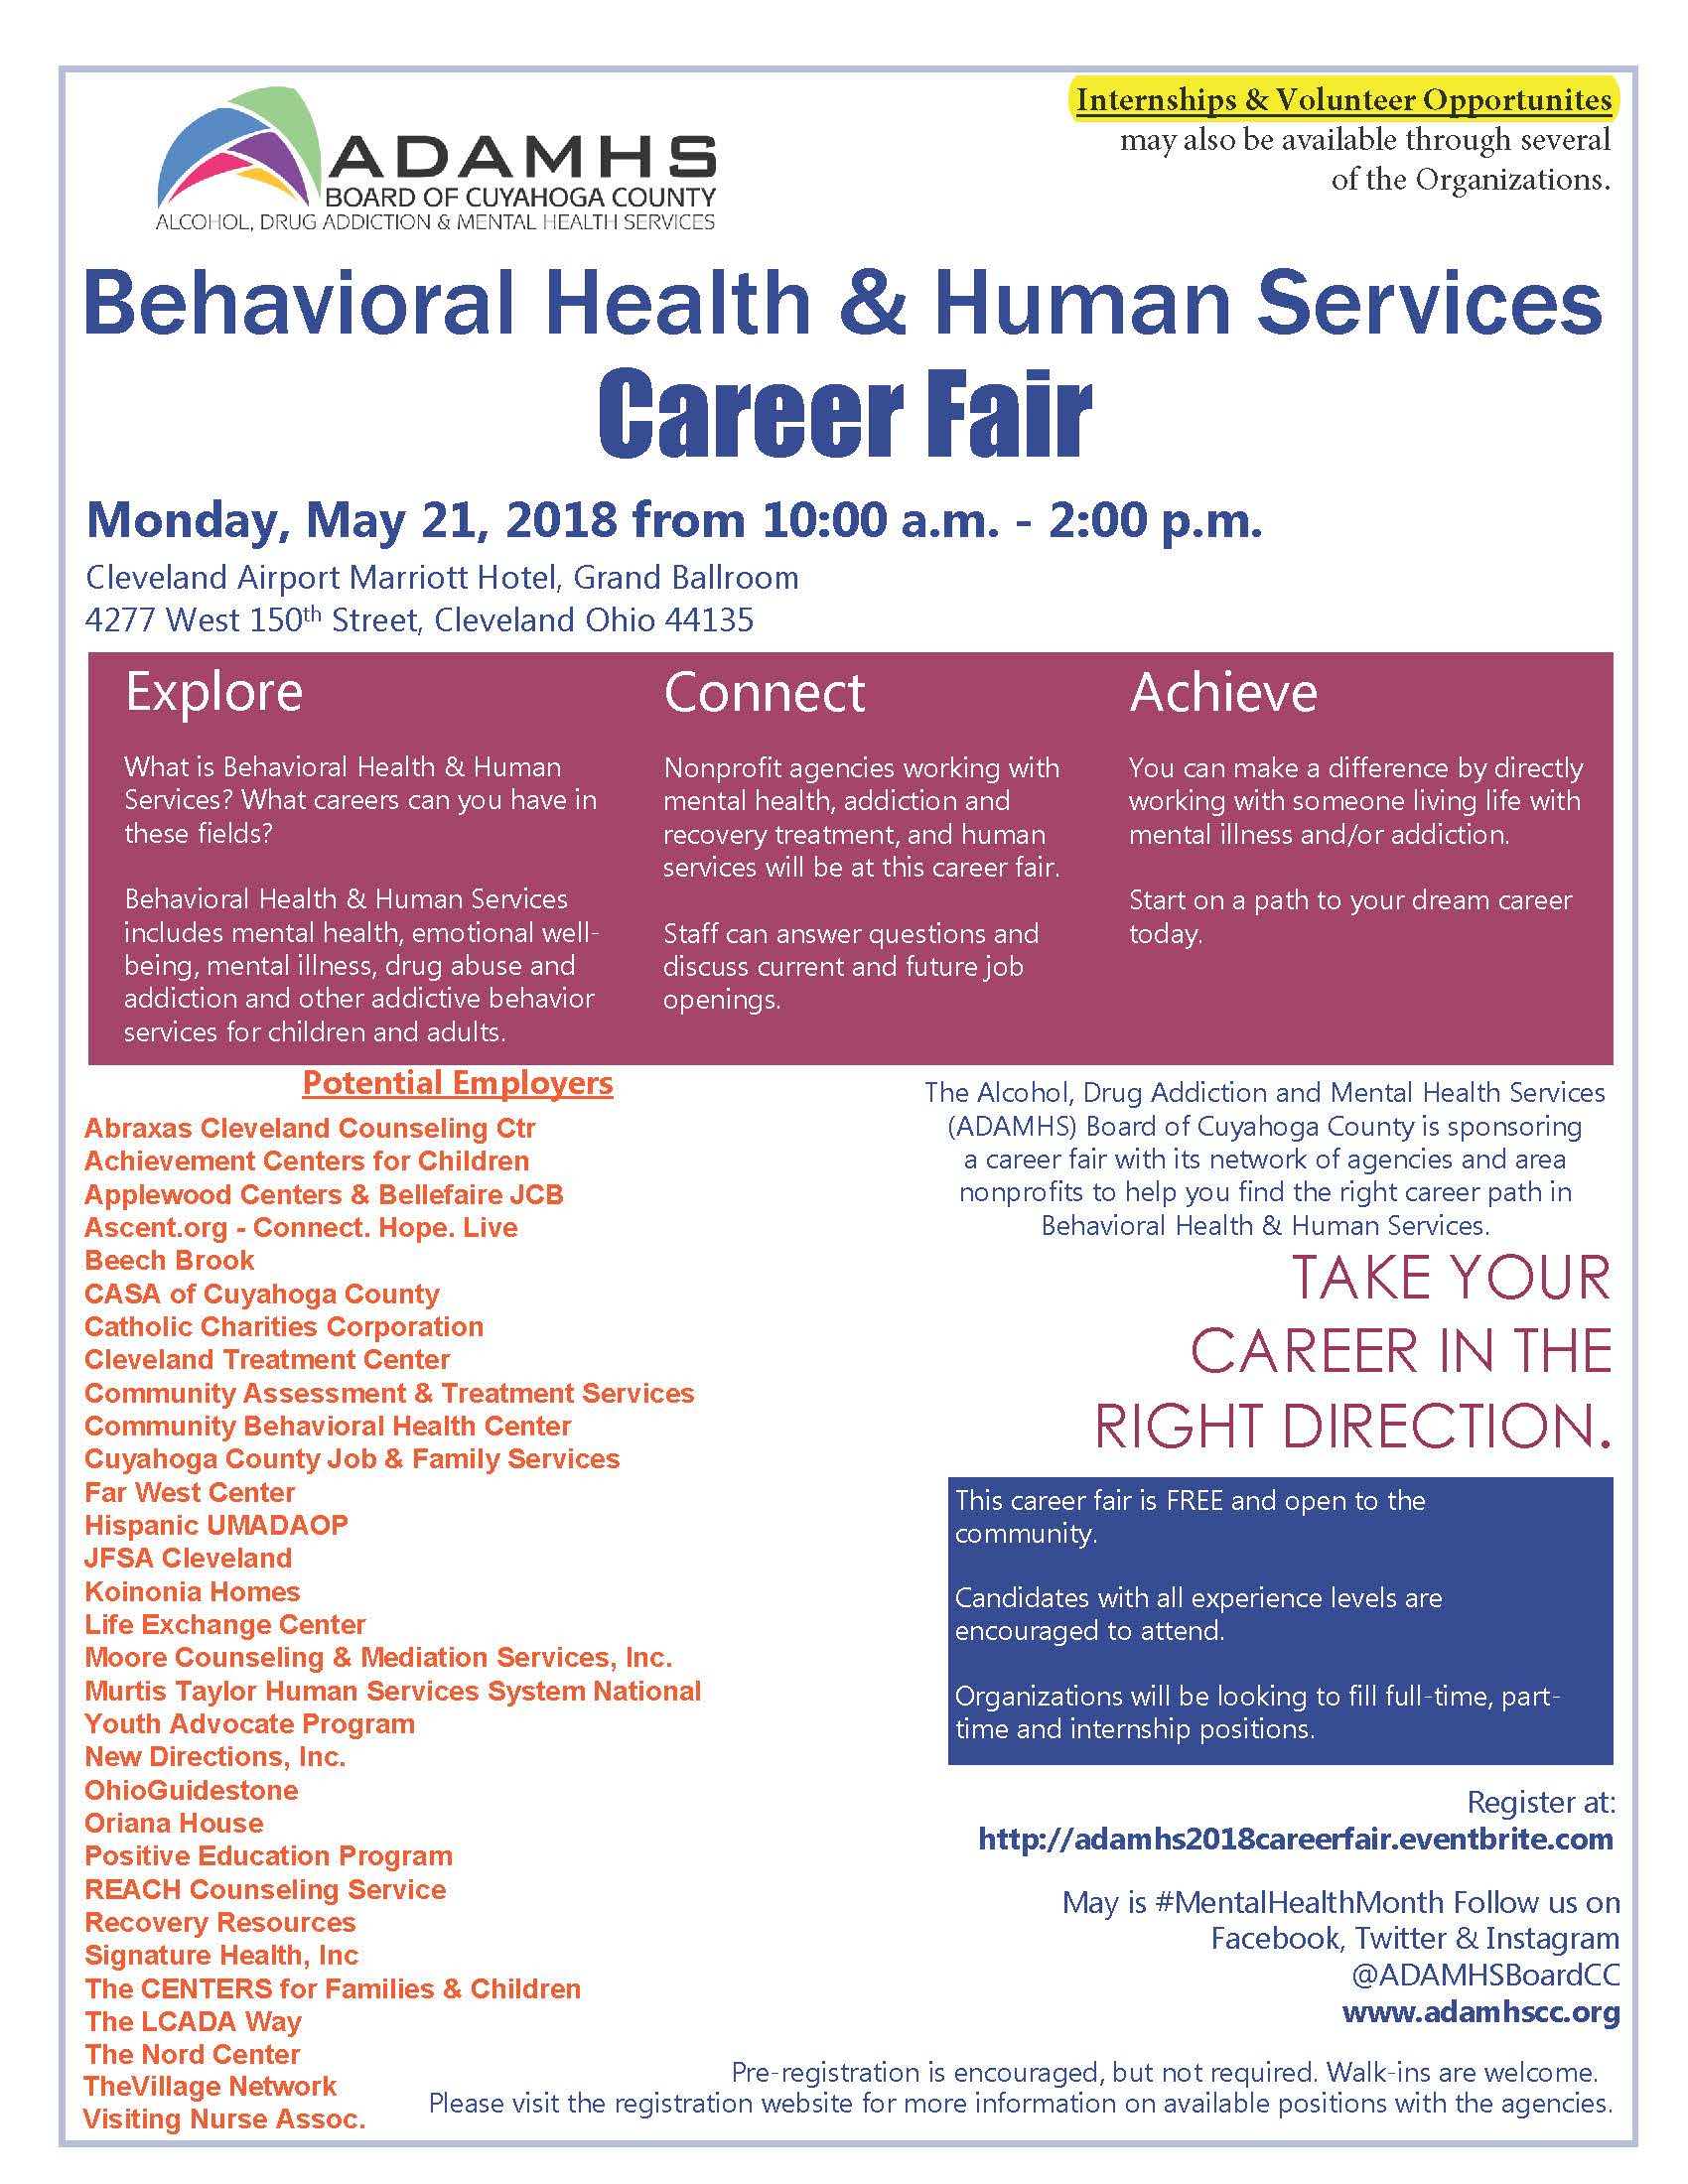 Behavioral Health & Human Services Career Fair